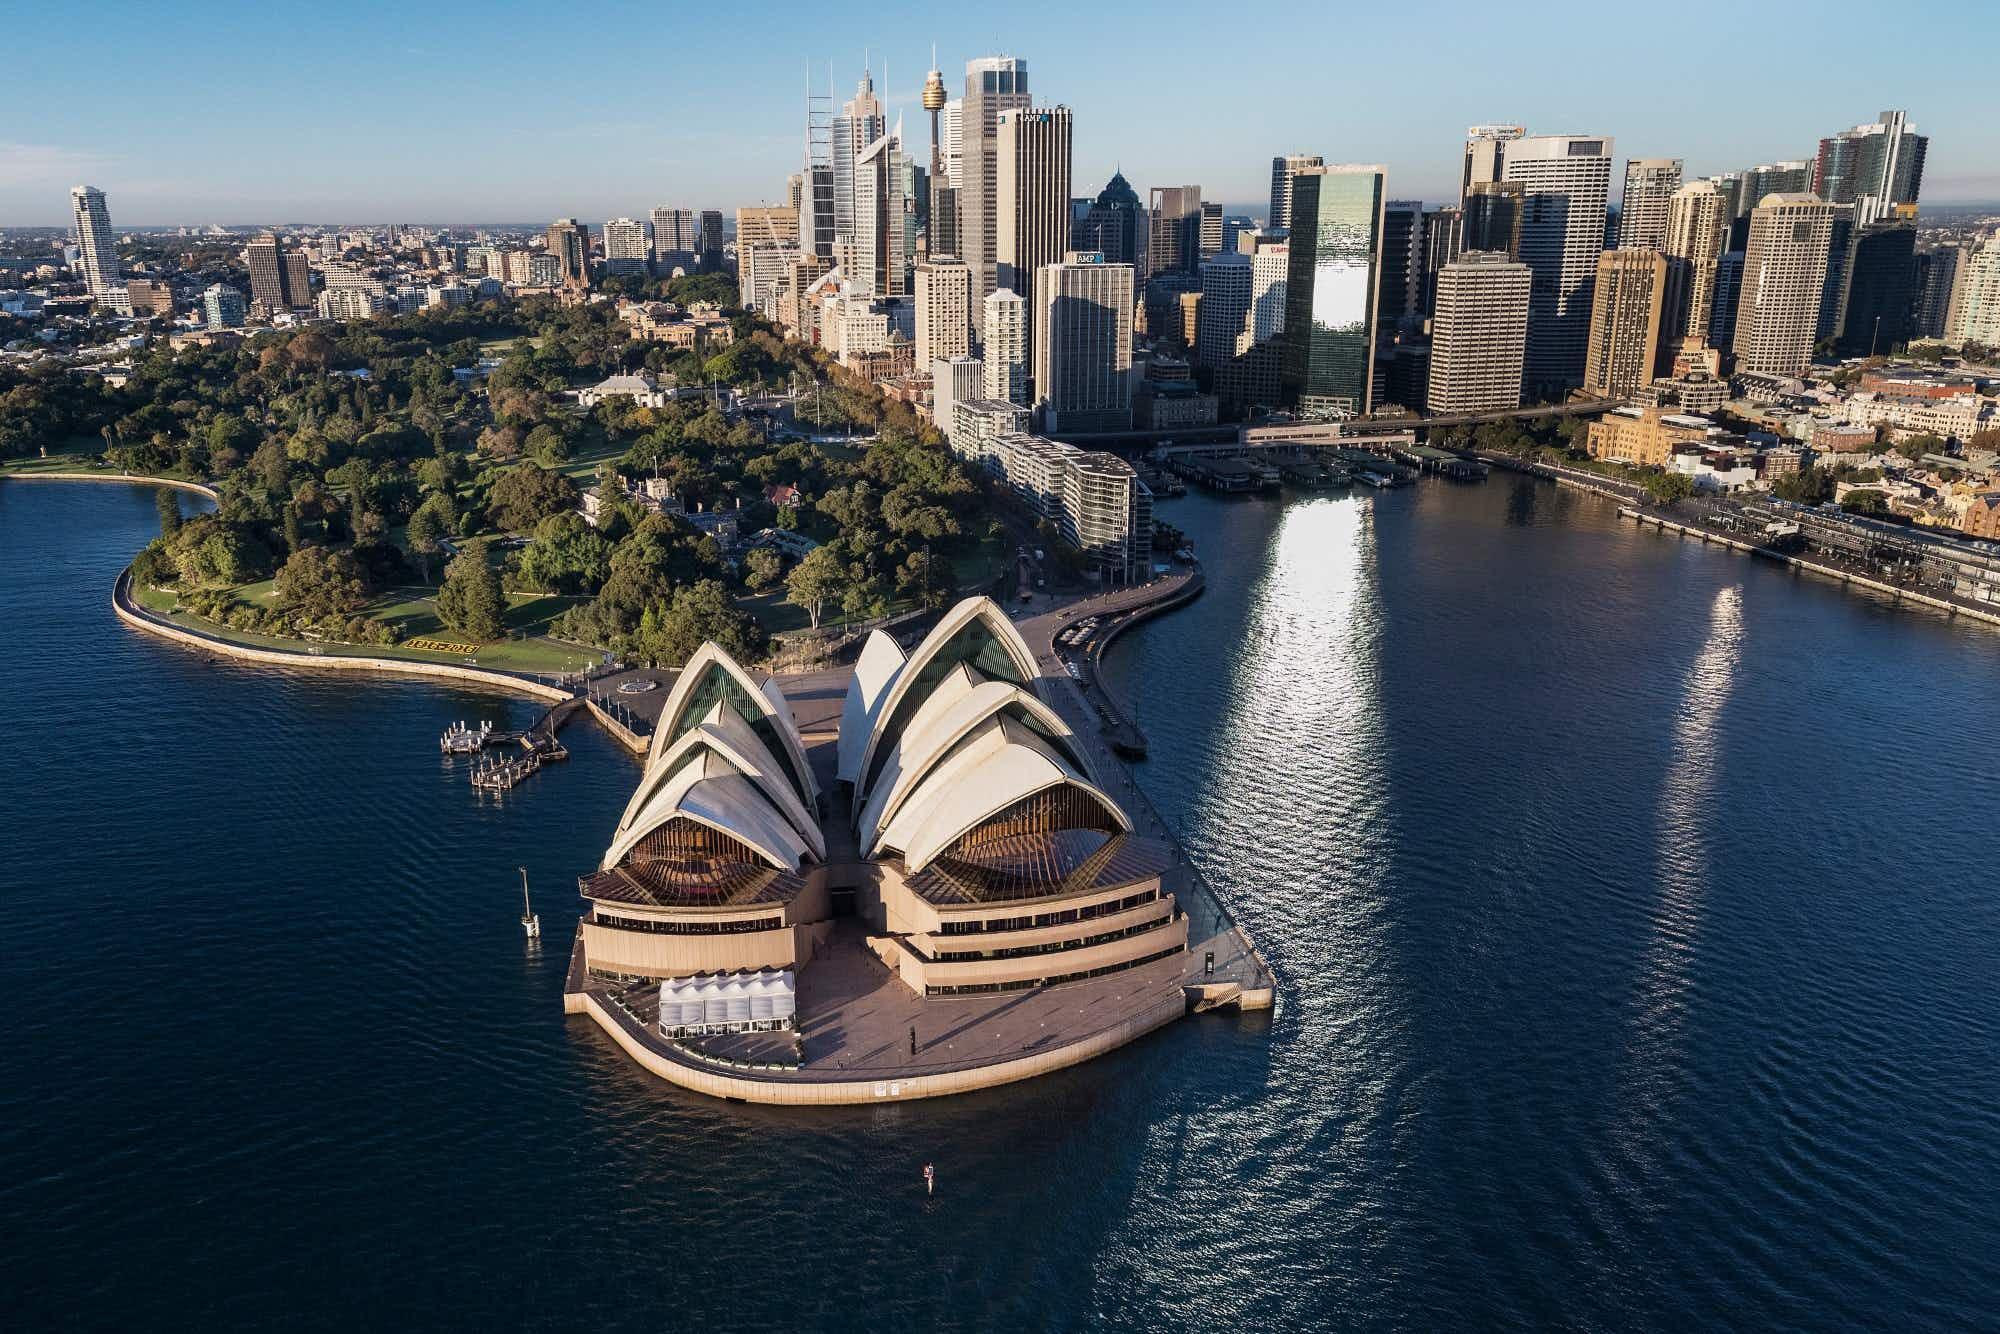 New exhibition on Sydney Opera House designer to open in Denmark